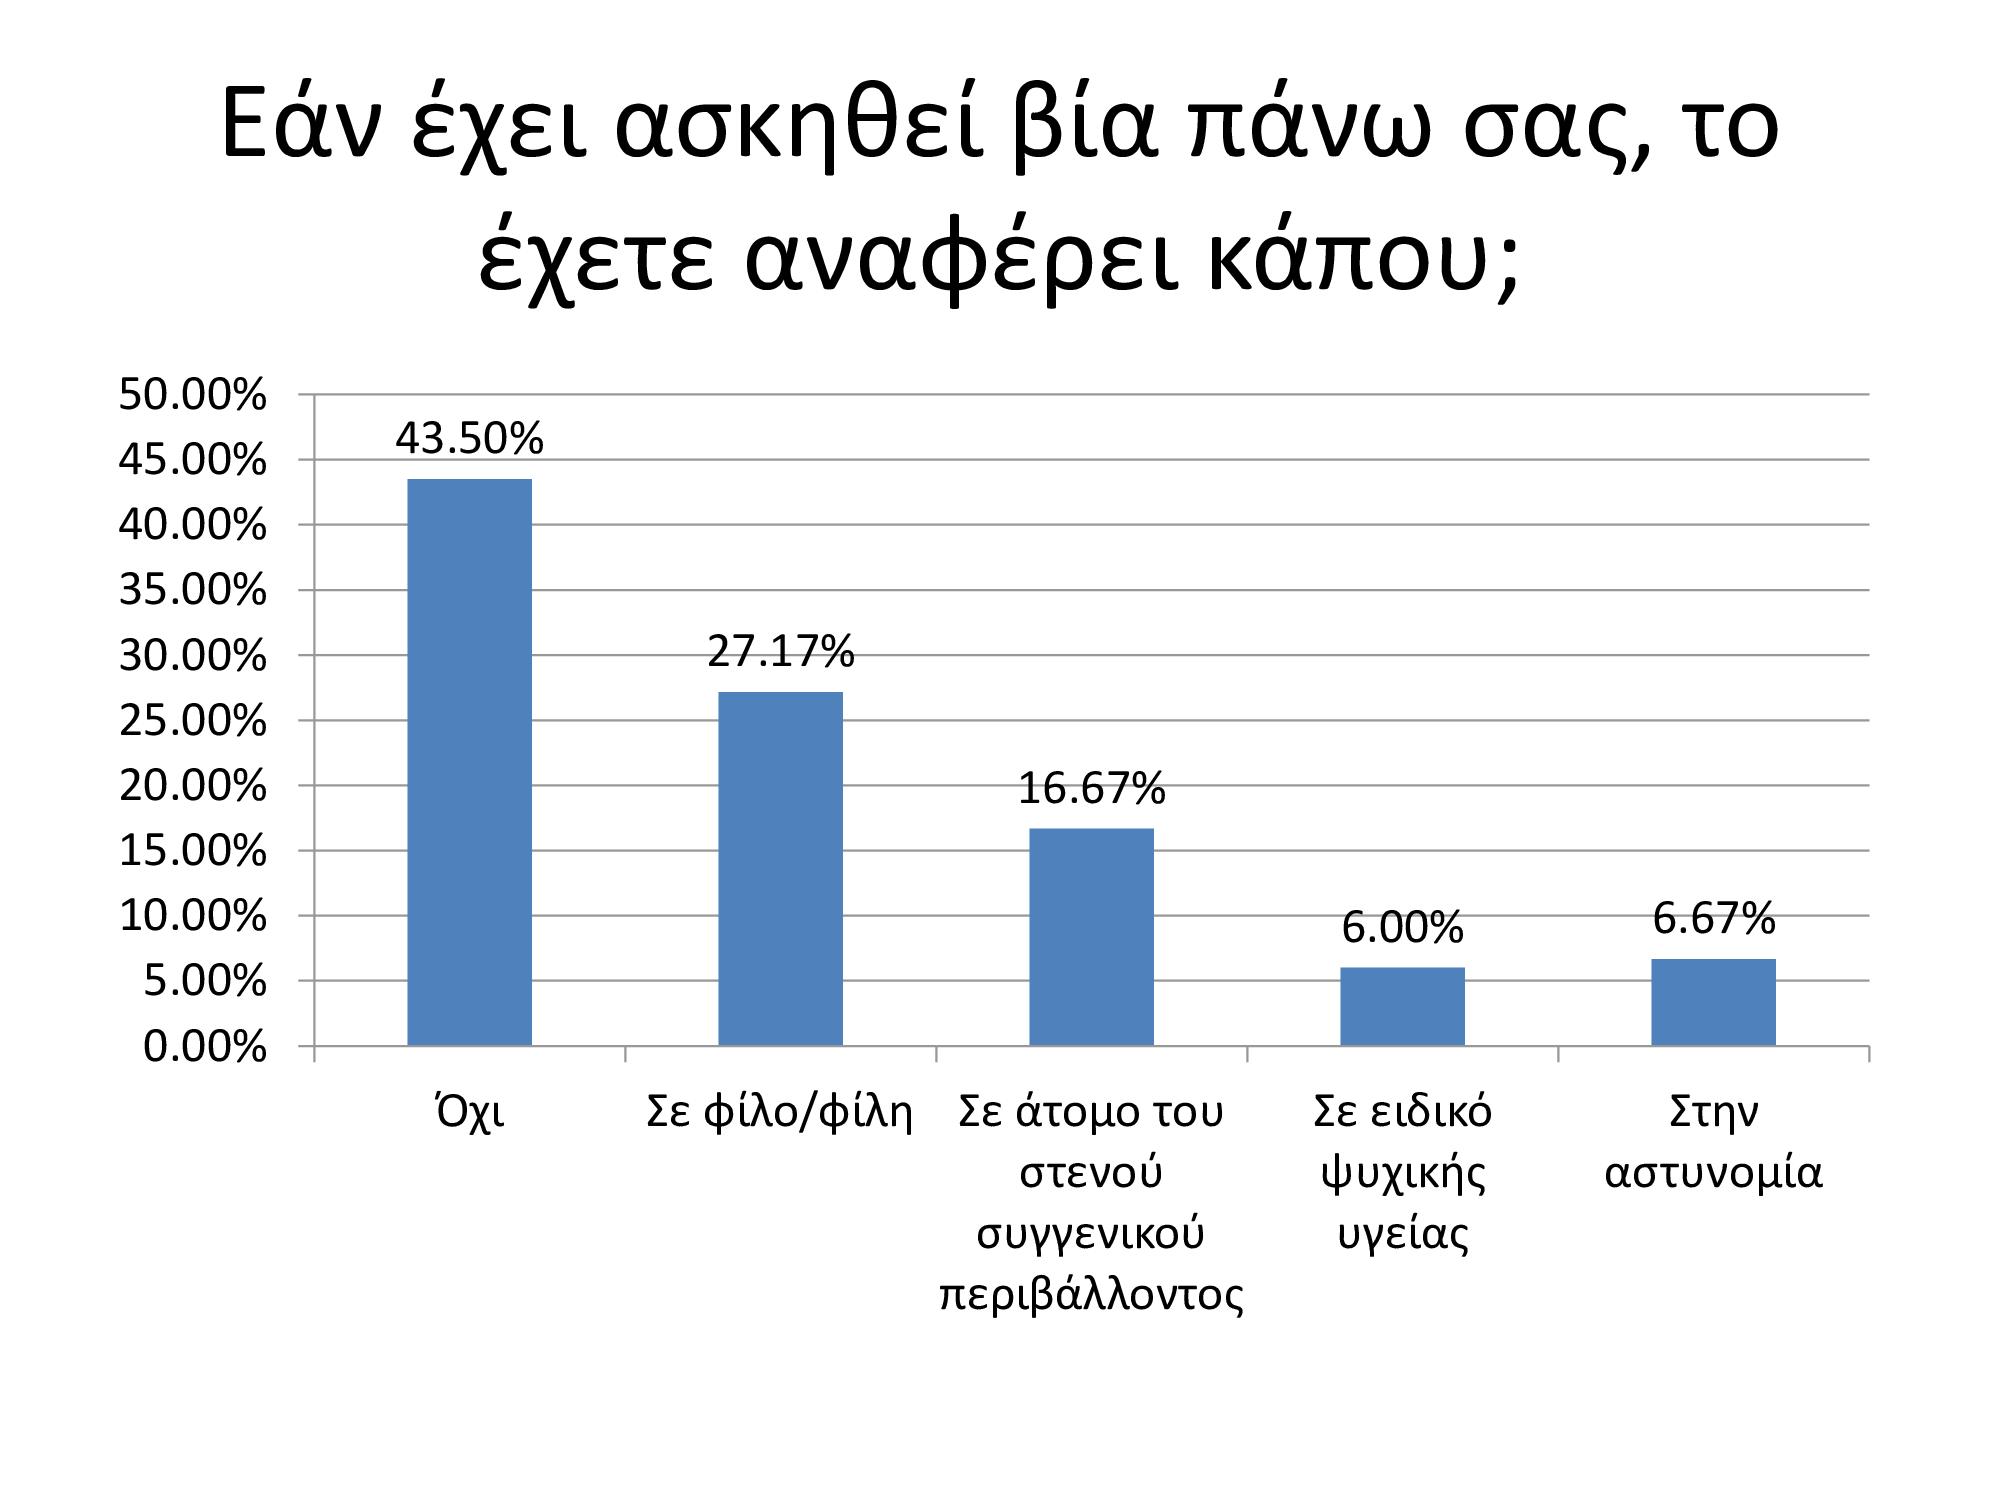 %ce%ad%cf%81%ce%b5%cf%85%ce%bd%ce%b1-%ce%b3%cf%81%ce%bf%ce%b8%ce%b9%ce%ac-%cf%84%ce%bf%cf%85-%ce%b1%ce%bd%ce%b4%cf%81%ce%bf%ce%bb%ce%bf%ce%b3%ce%b9%ce%ba%ce%bf%cf%8d-%ce%b9%ce%bd%cf%83%cf%84%ce%b91